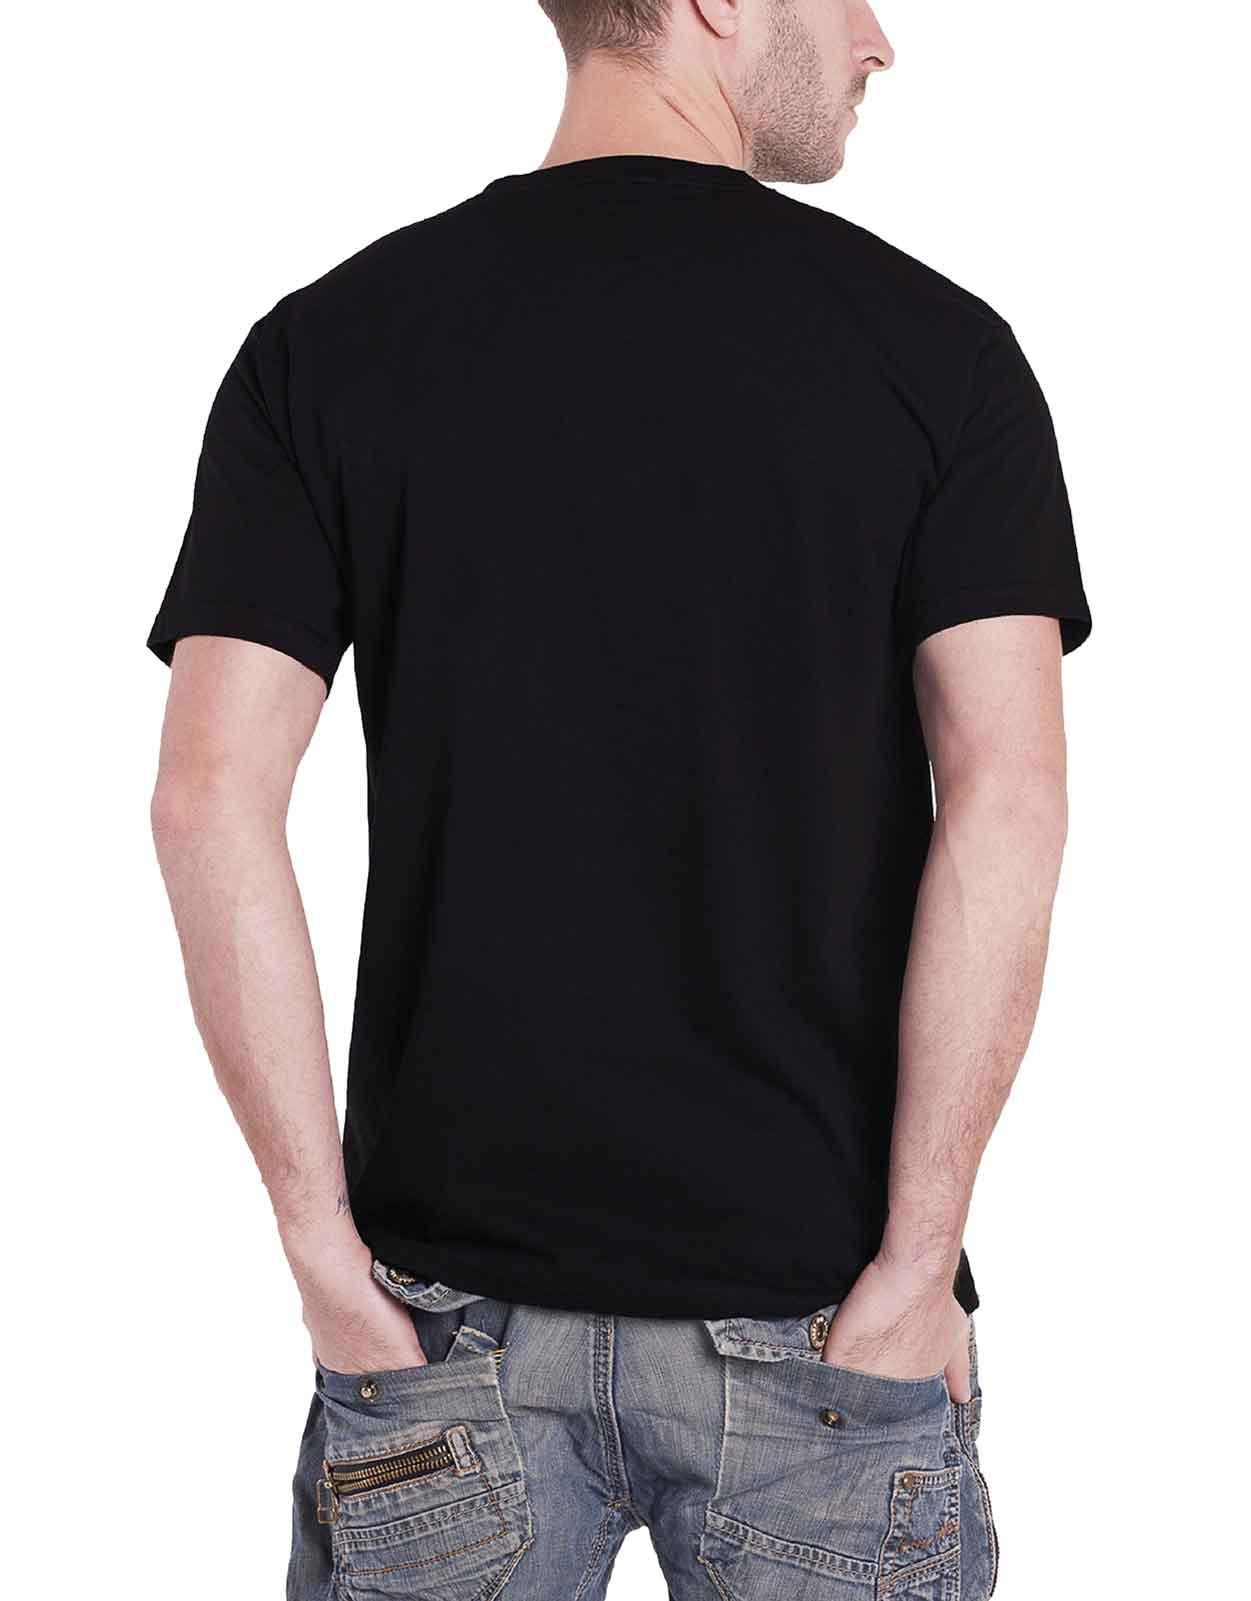 Star-Wars-Camiseta-Para-Hombres-Regreso-del-Jedi-R2D2-Luke-Leia-oficial-nuevo miniatura 7